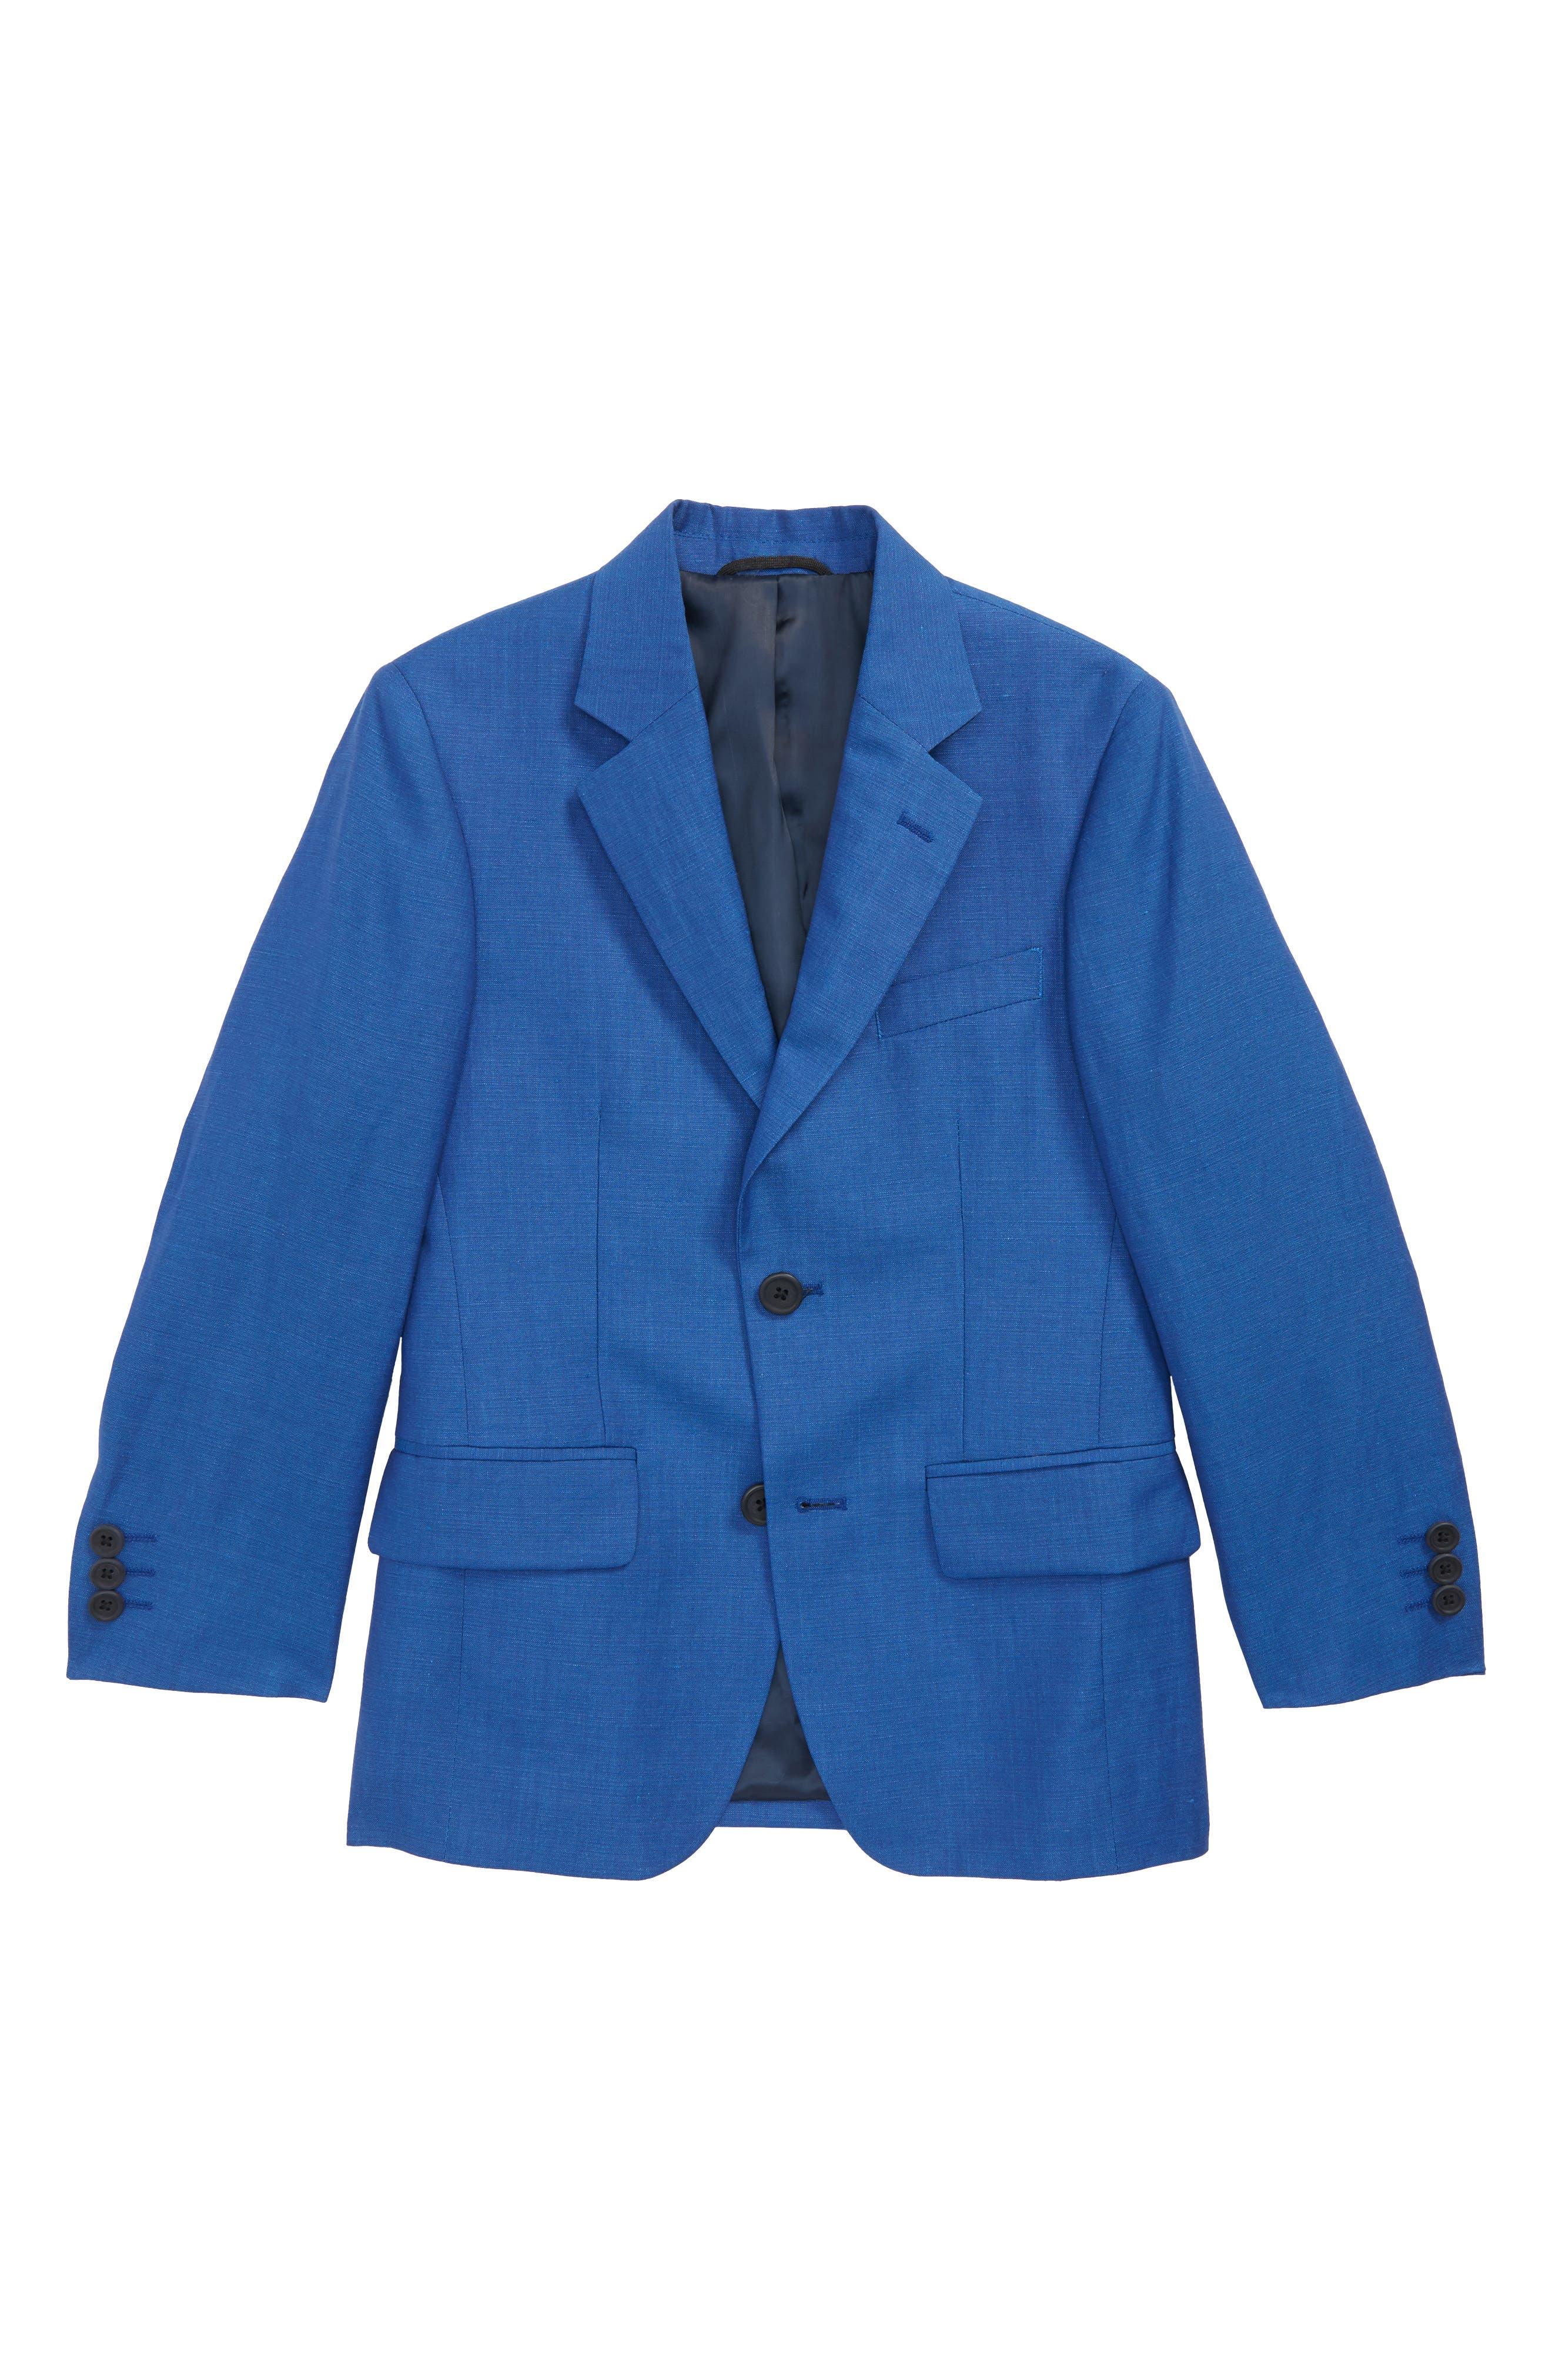 Wool & Linen Sport Coat,                             Main thumbnail 1, color,                             422